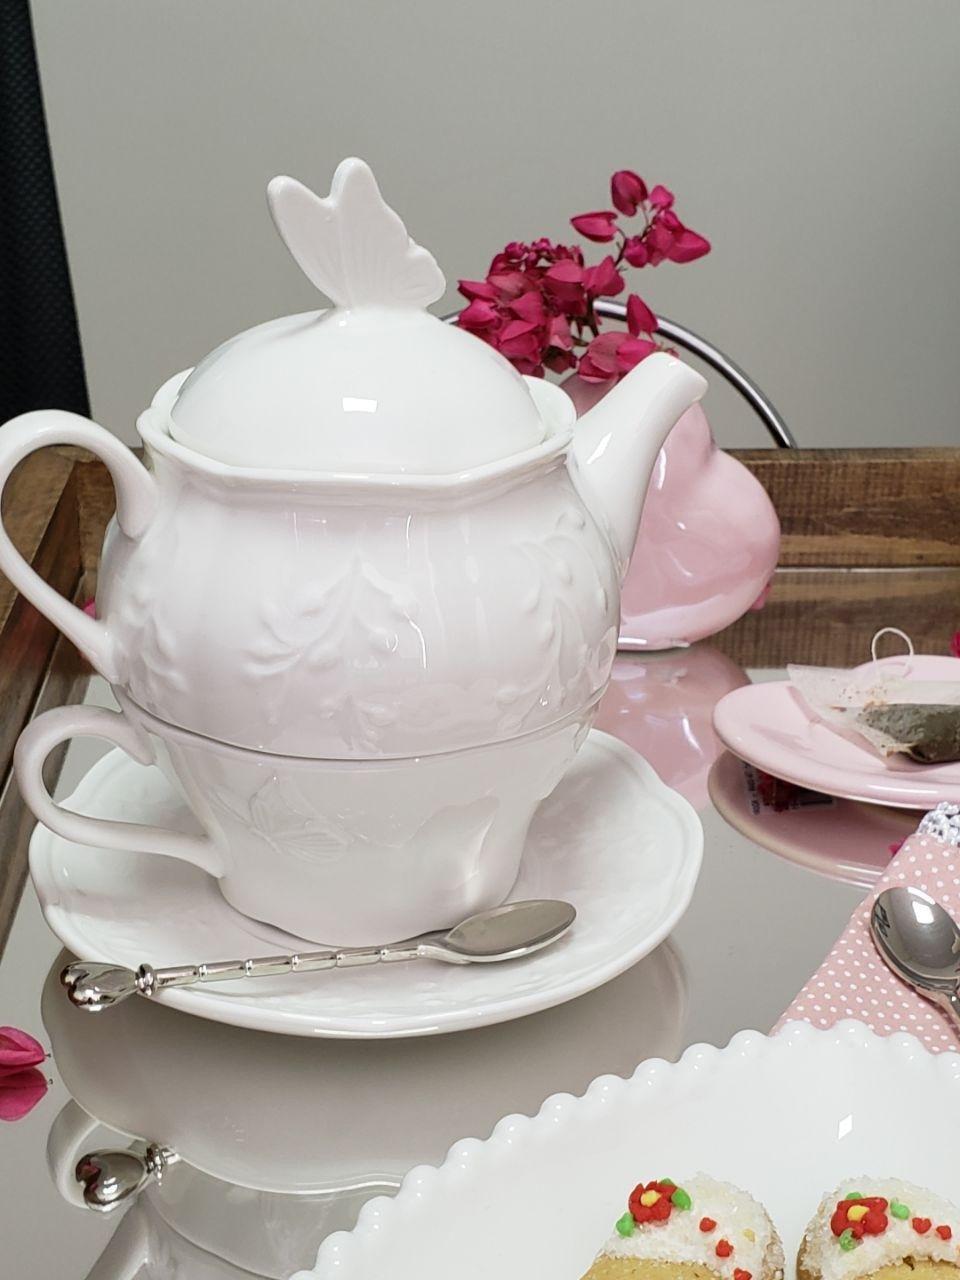 conjunto cha porcelana new done butterfly 8524 a lyor casa cafe e mel 9